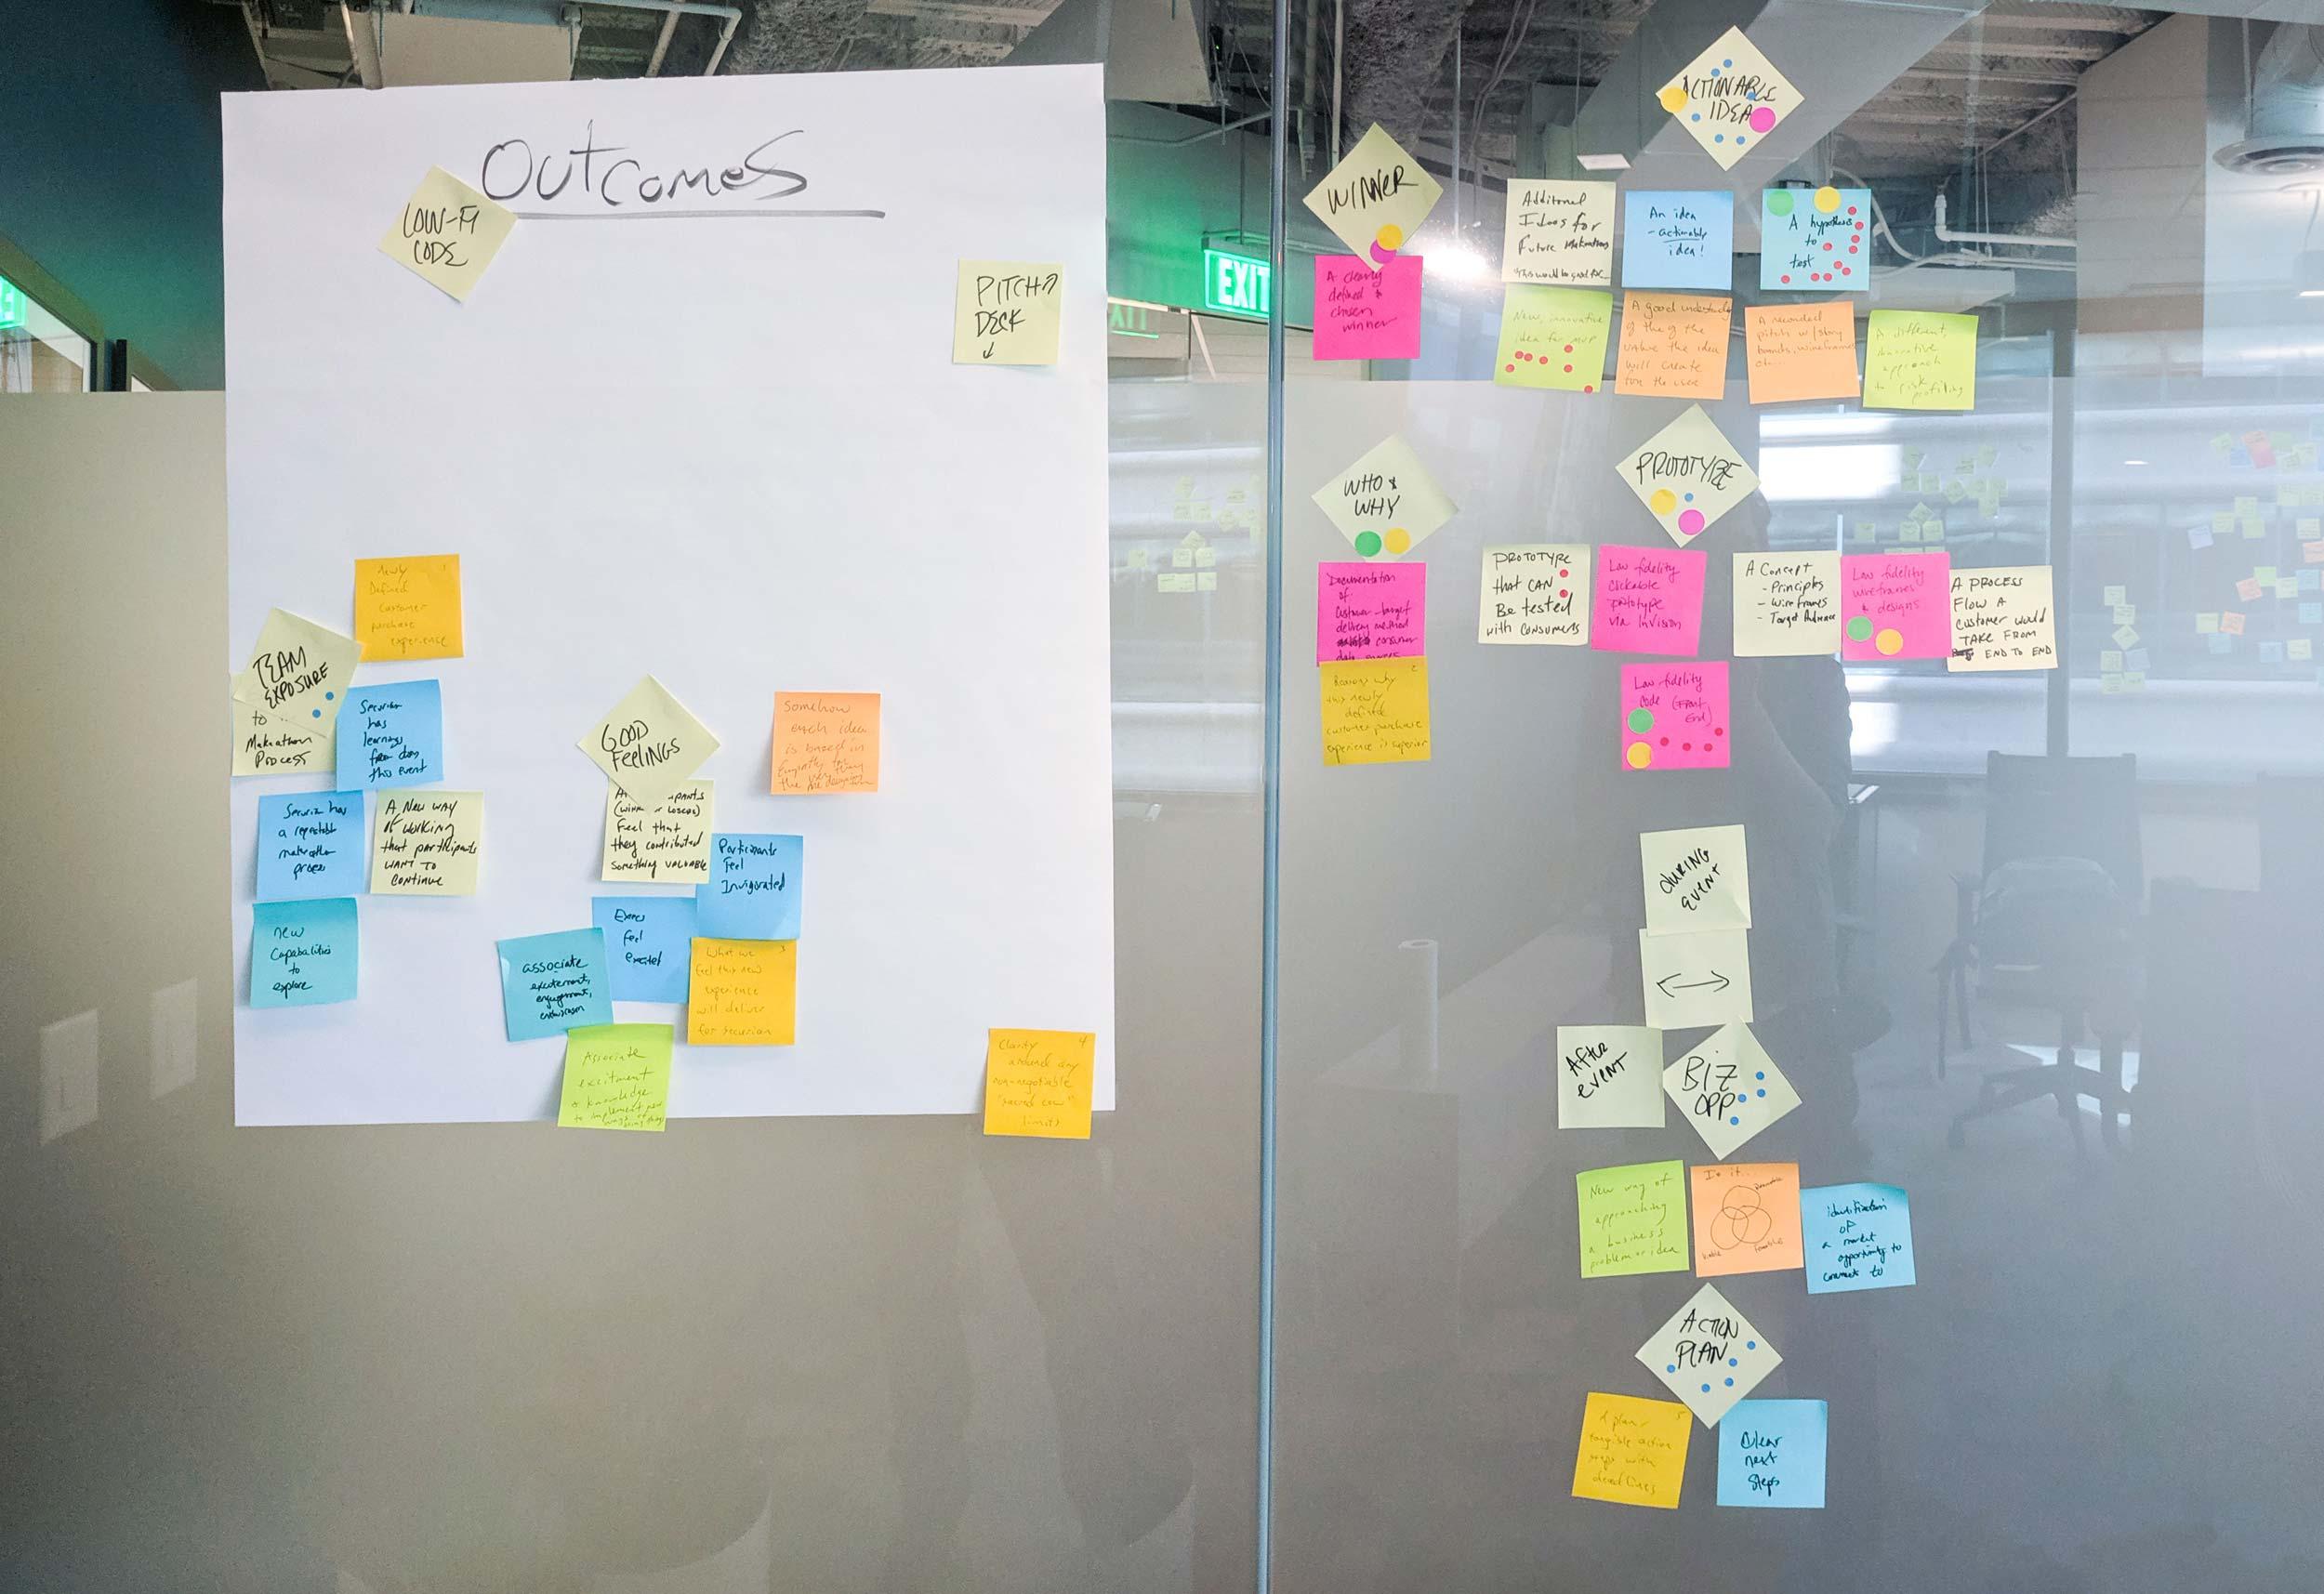 Workshop post it notes